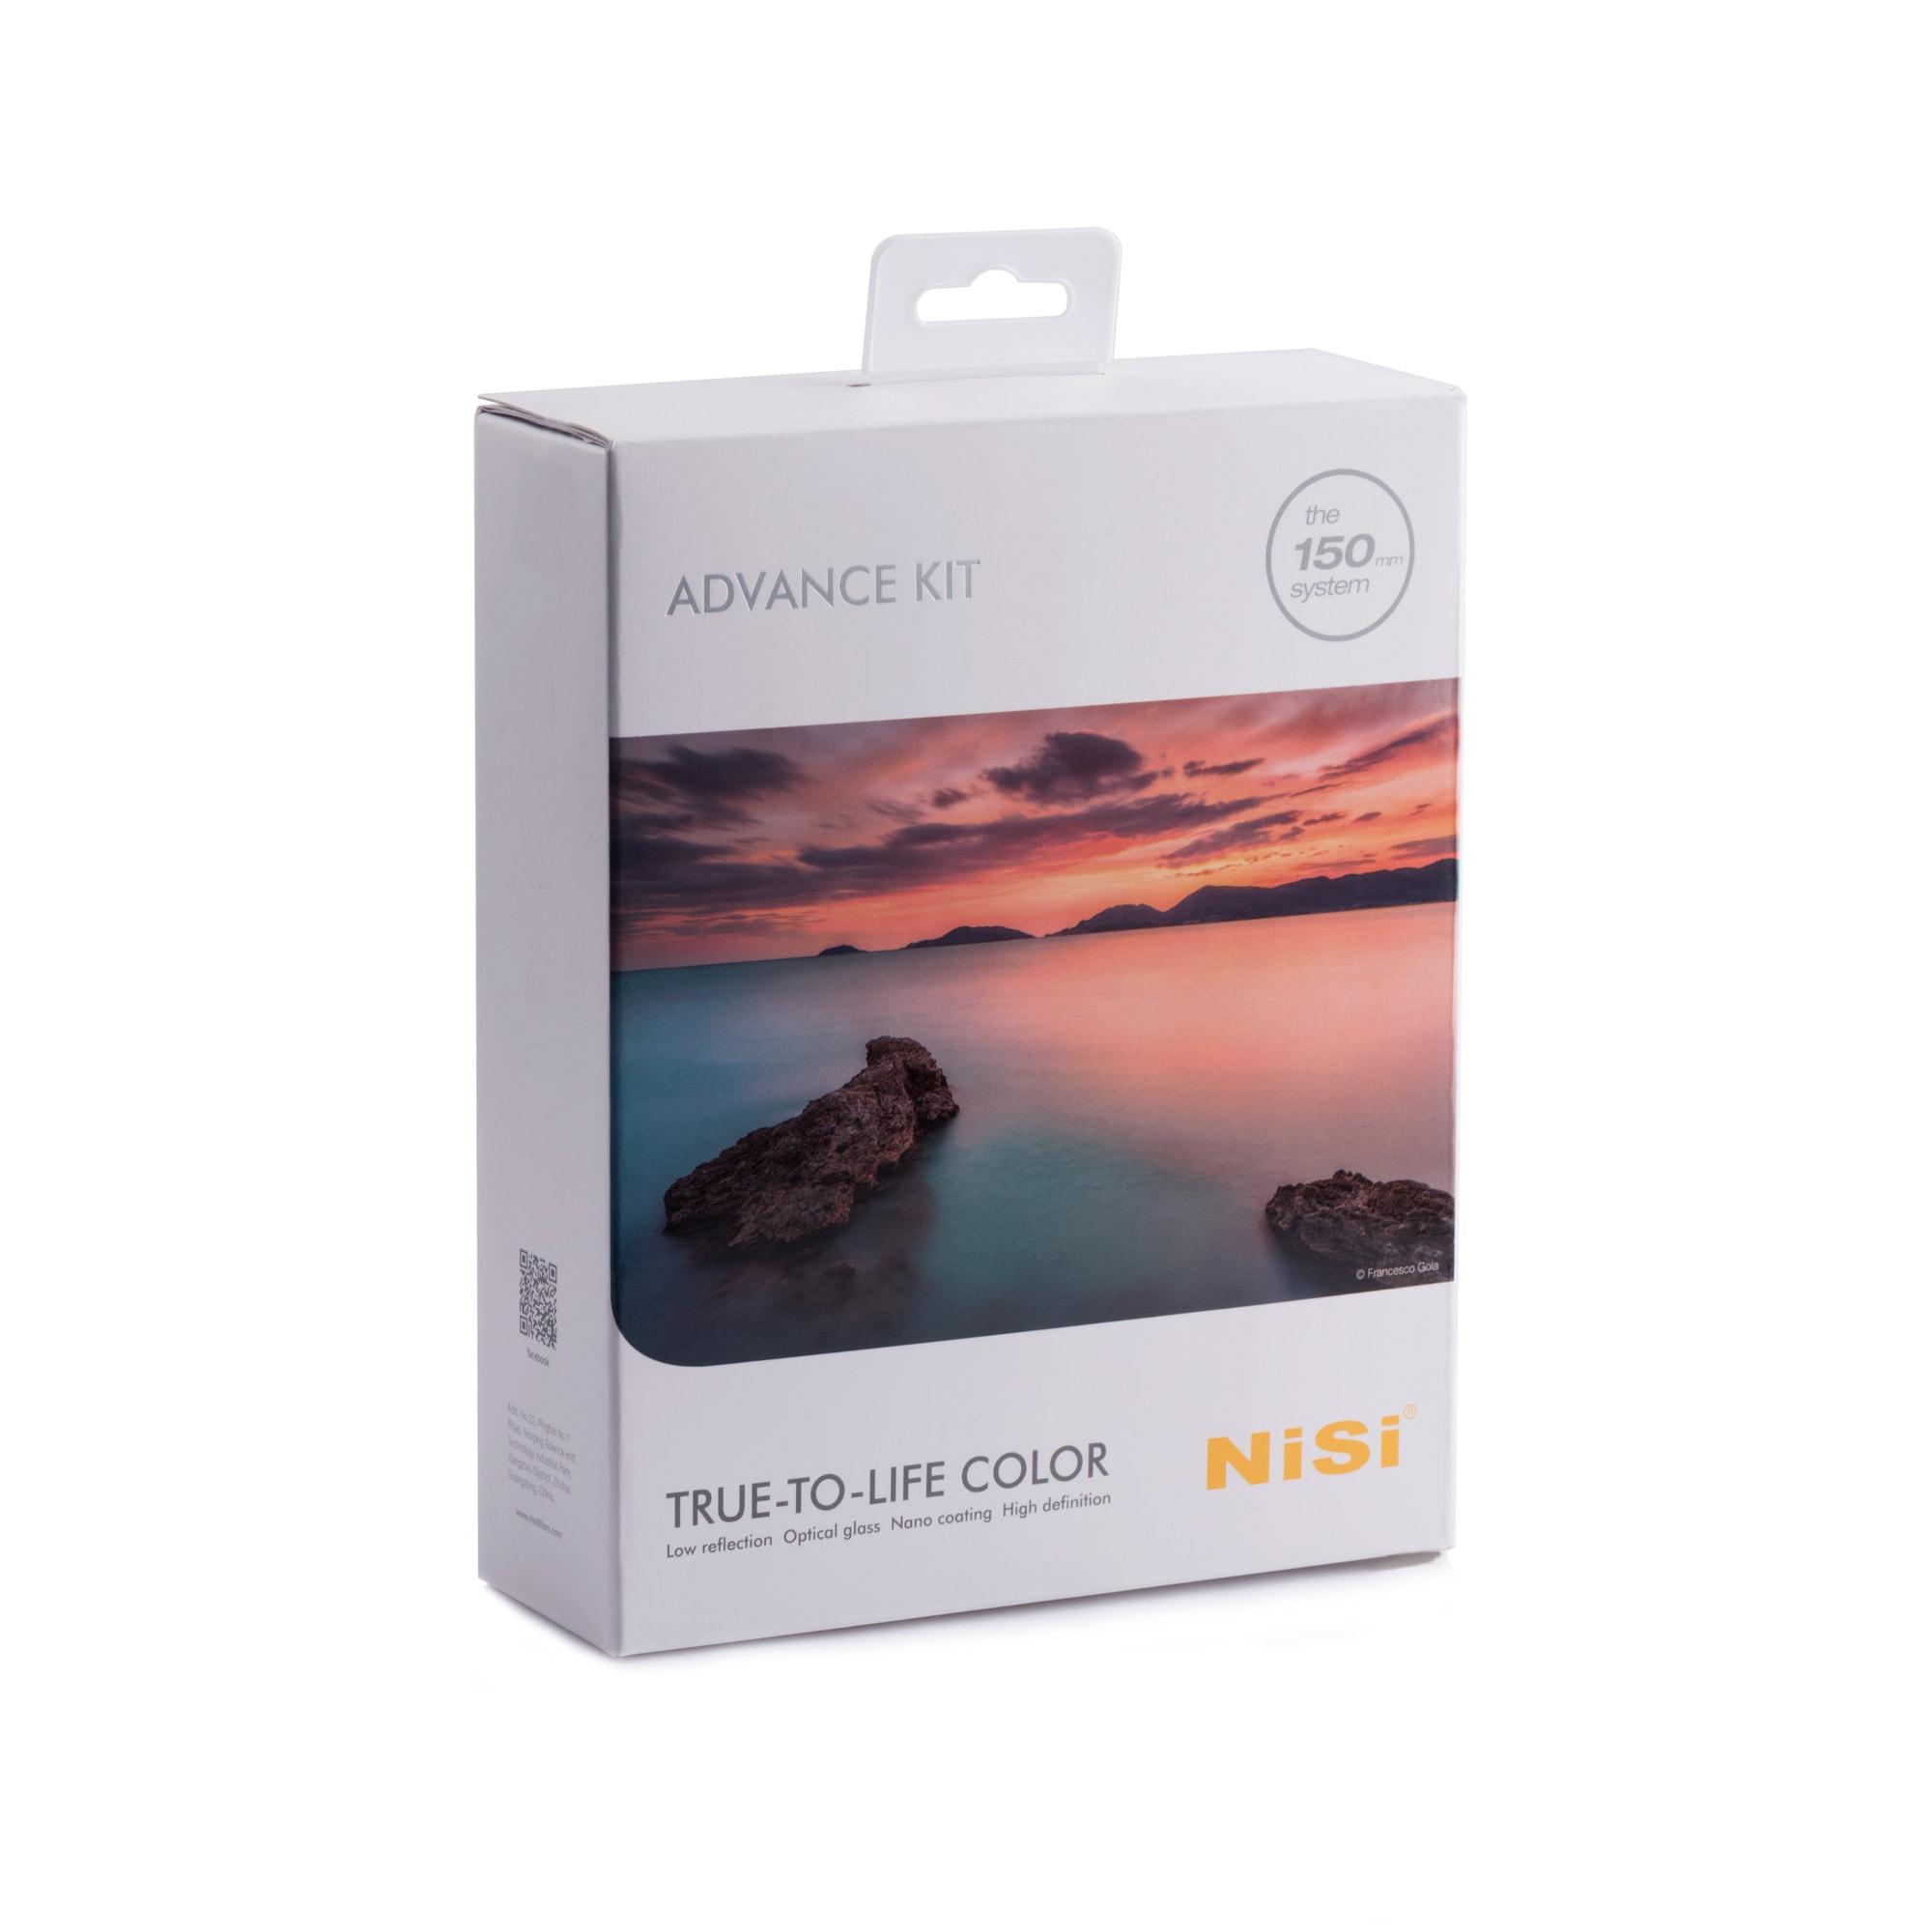 Nisi advance kit 150mm